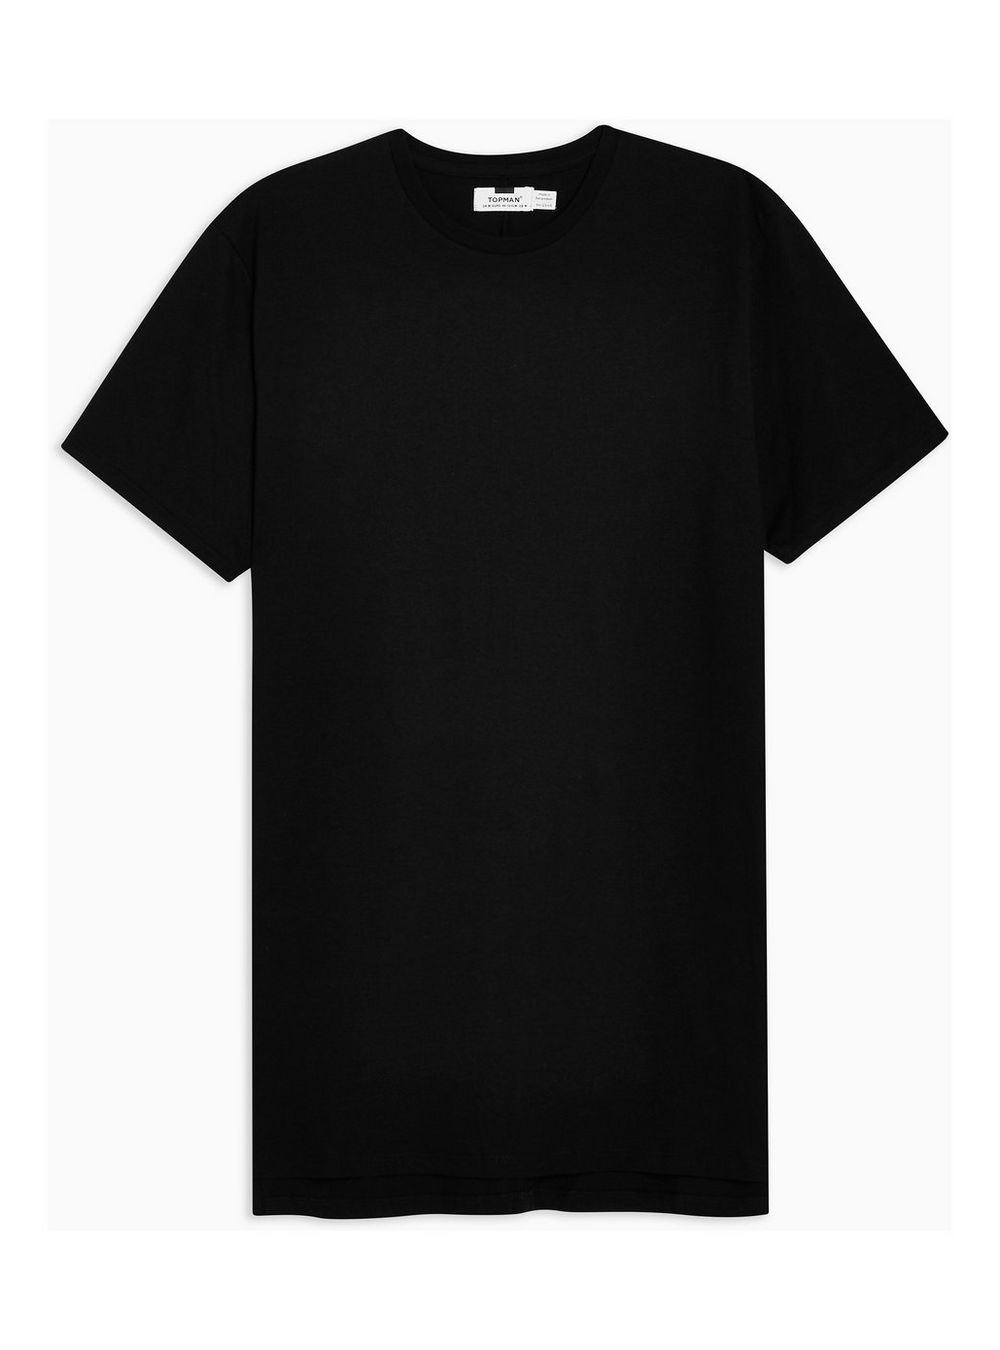 X-Future Mens Stylish Long Sleeve Crewneck Printing Slim Fit Stretch Muscle T-Shirts Tee